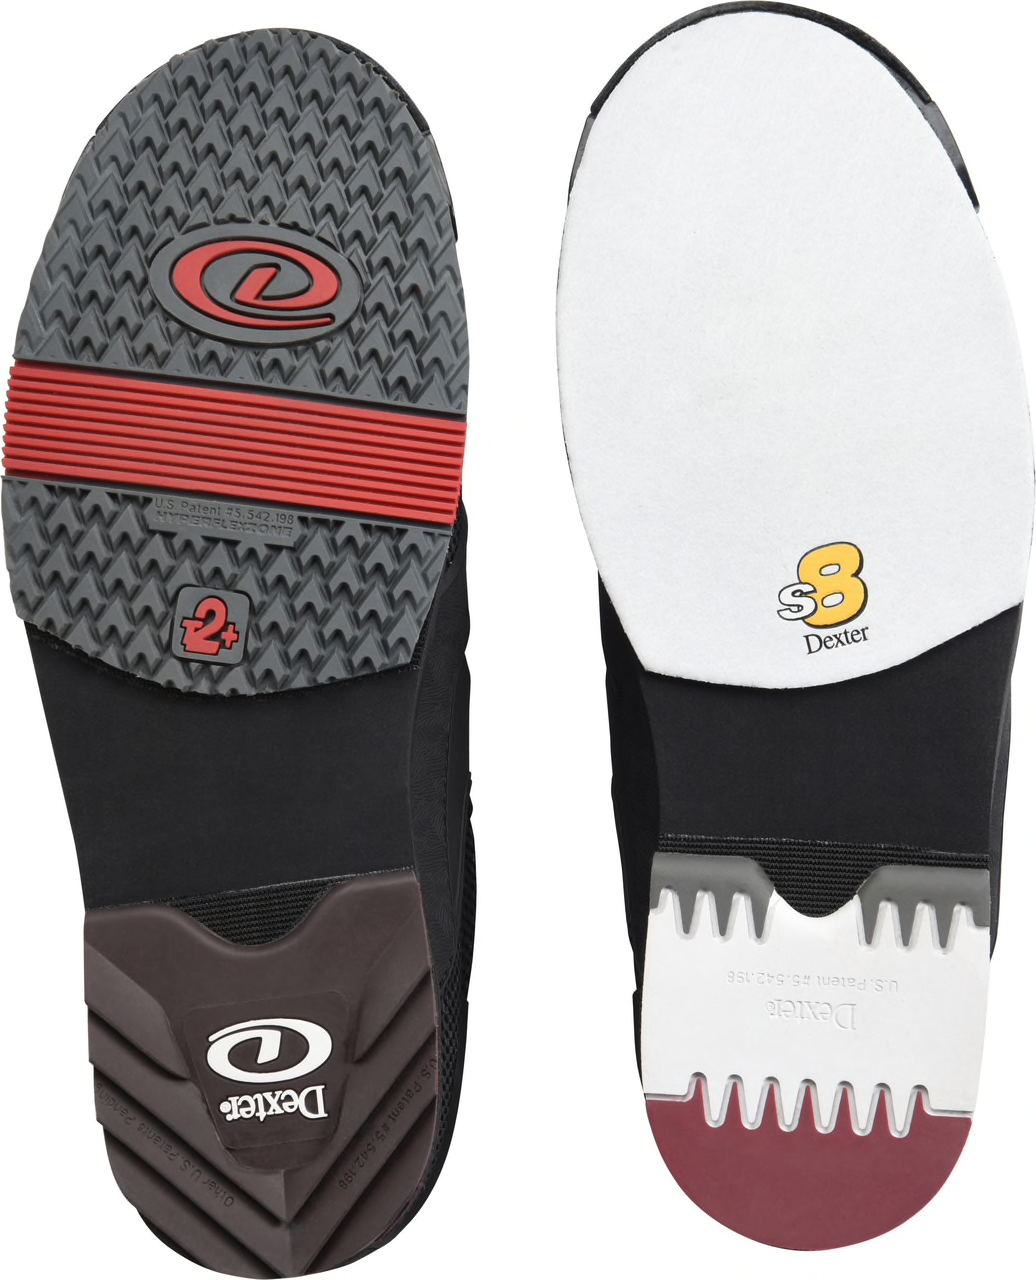 Dexter SST 8 Power-Frame Boa Mens Bowling Shoes